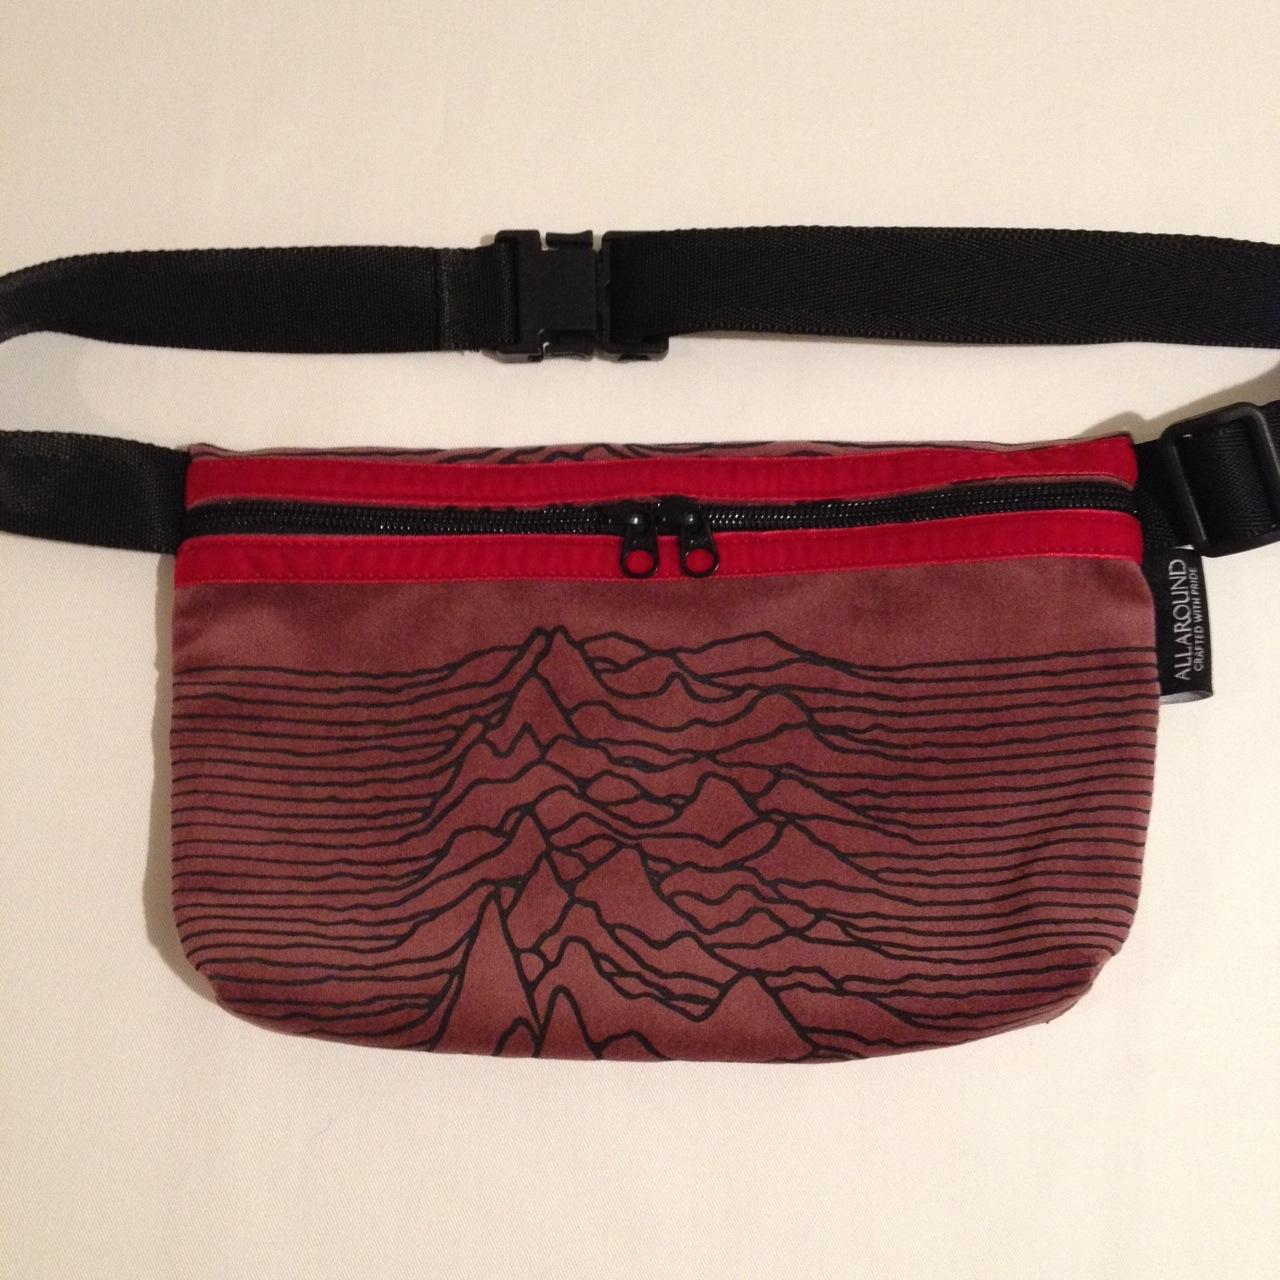 Rala x ALLAROUND COLLABORATION (Fac-10 mini waist pouch)_c0127070_1917418.jpg